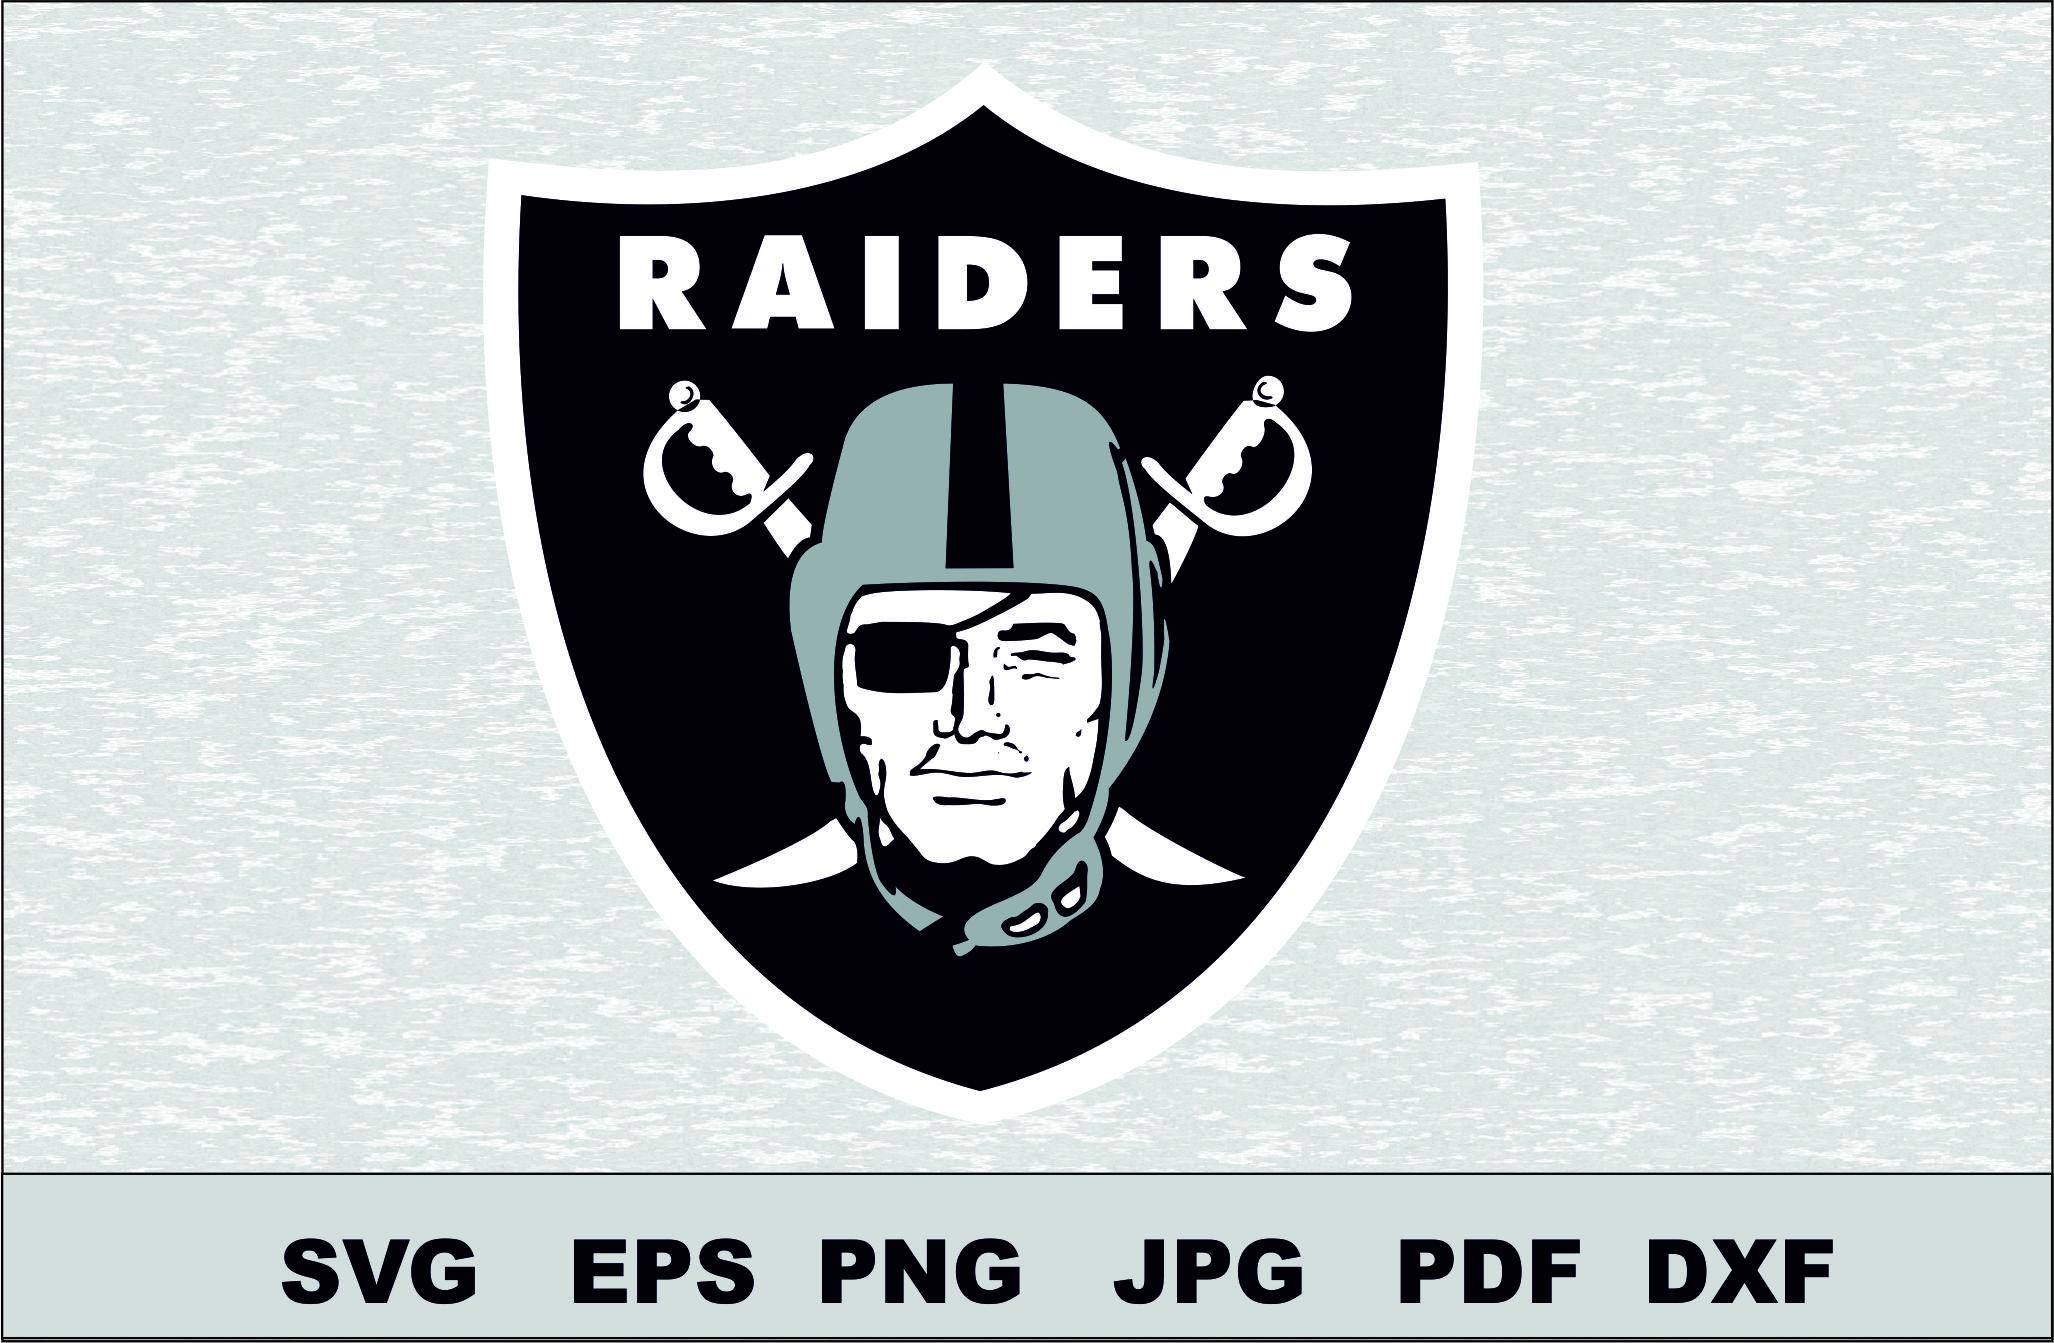 raiders svg #596, Download drawings